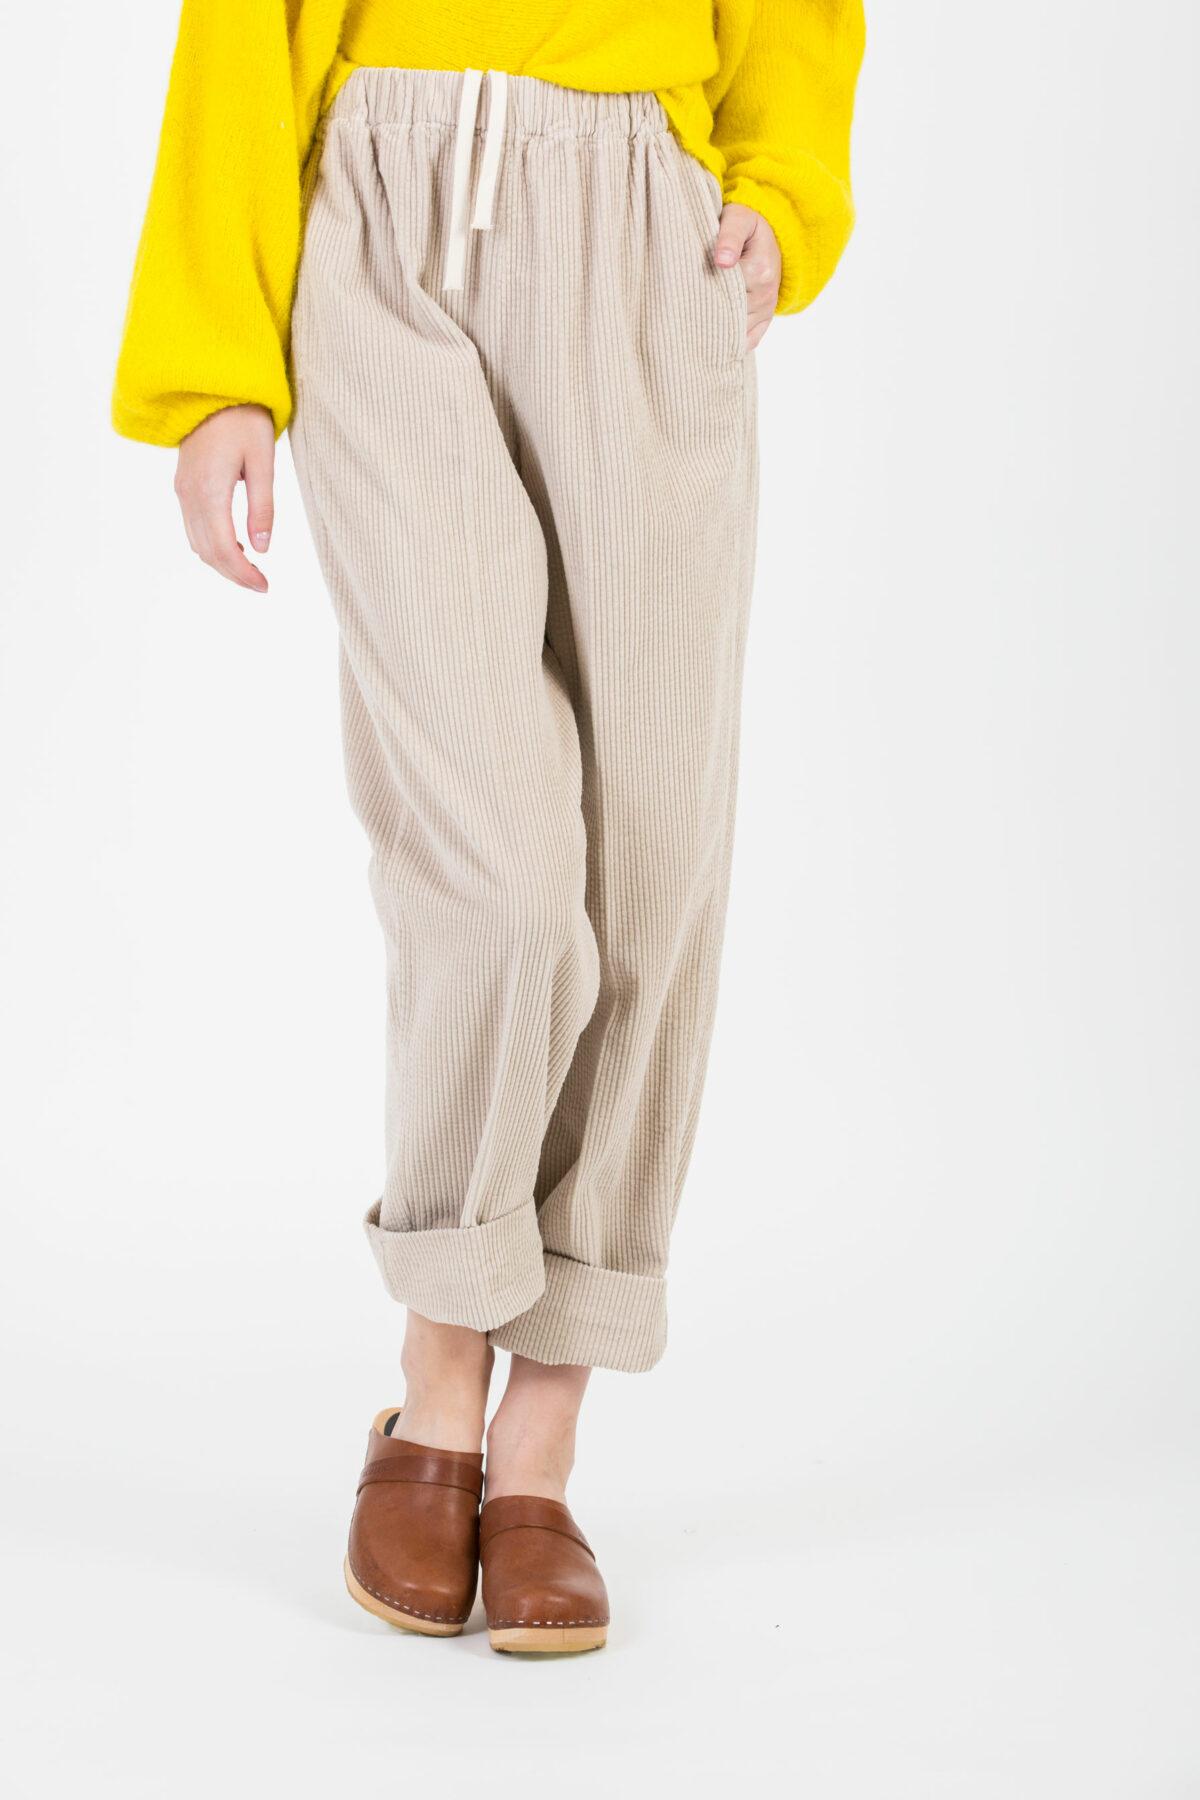 padow-mastic-pants-corduroy-american-vintage-matchboxathens